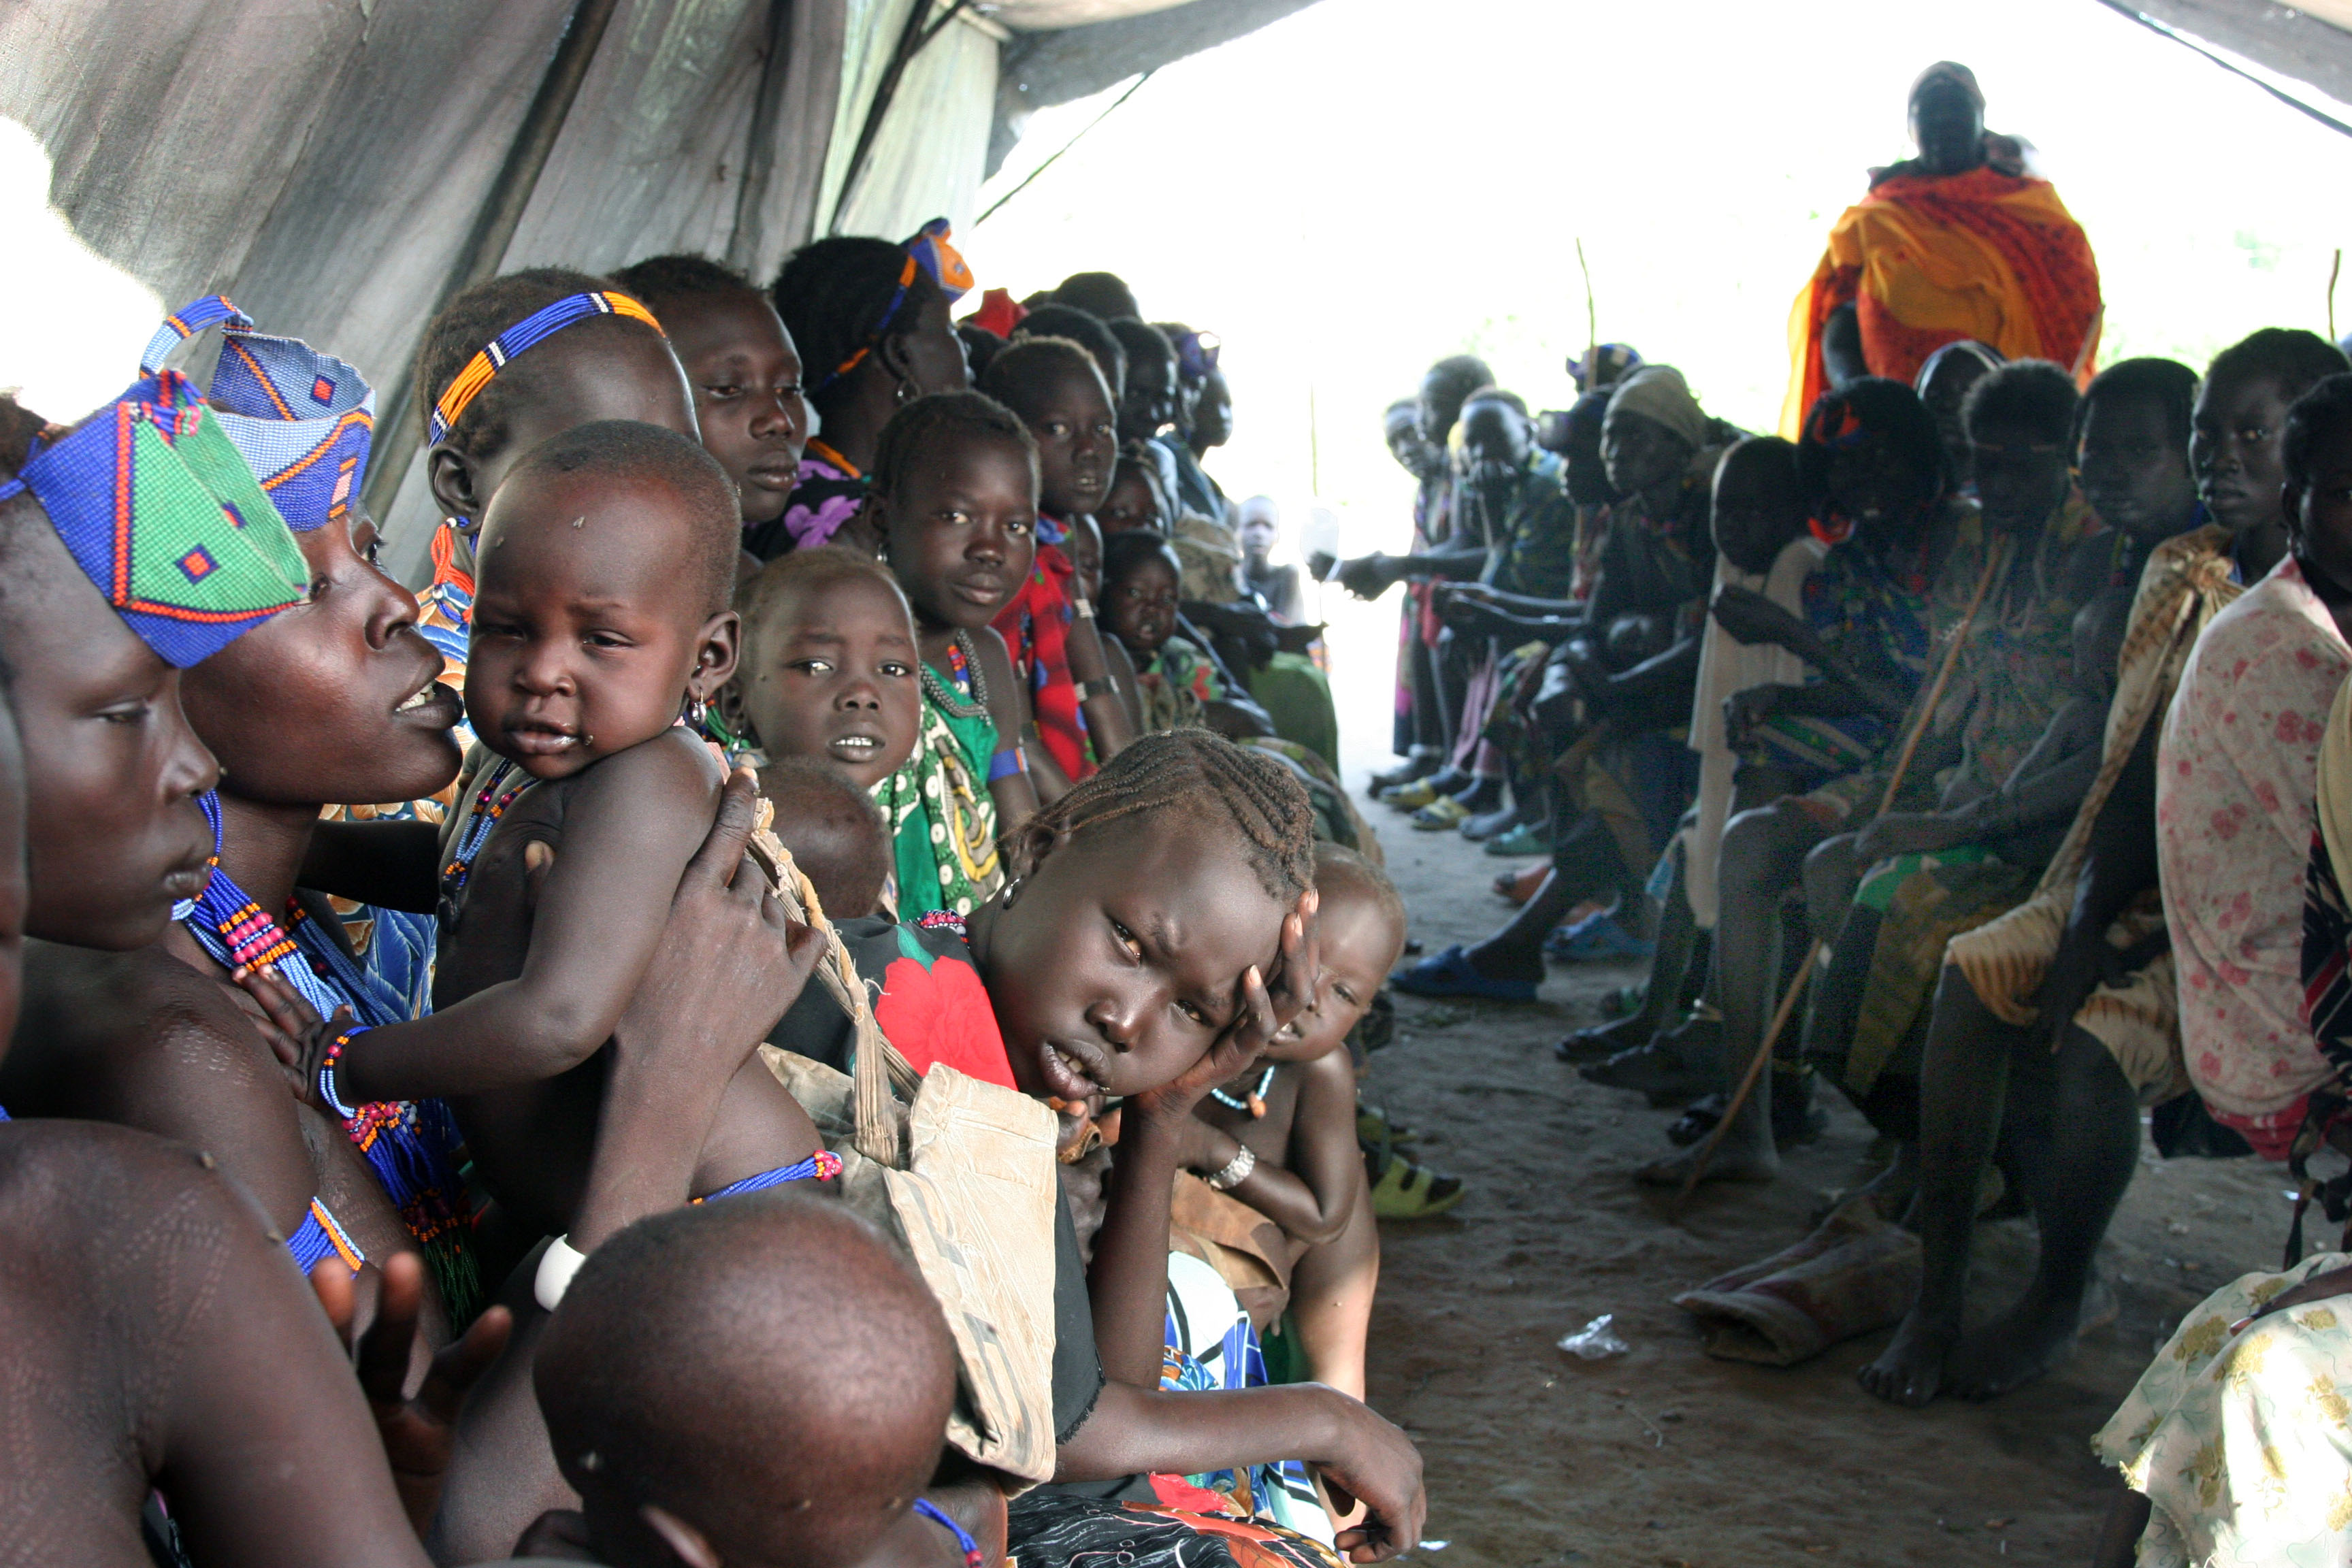 sudan - photo #23